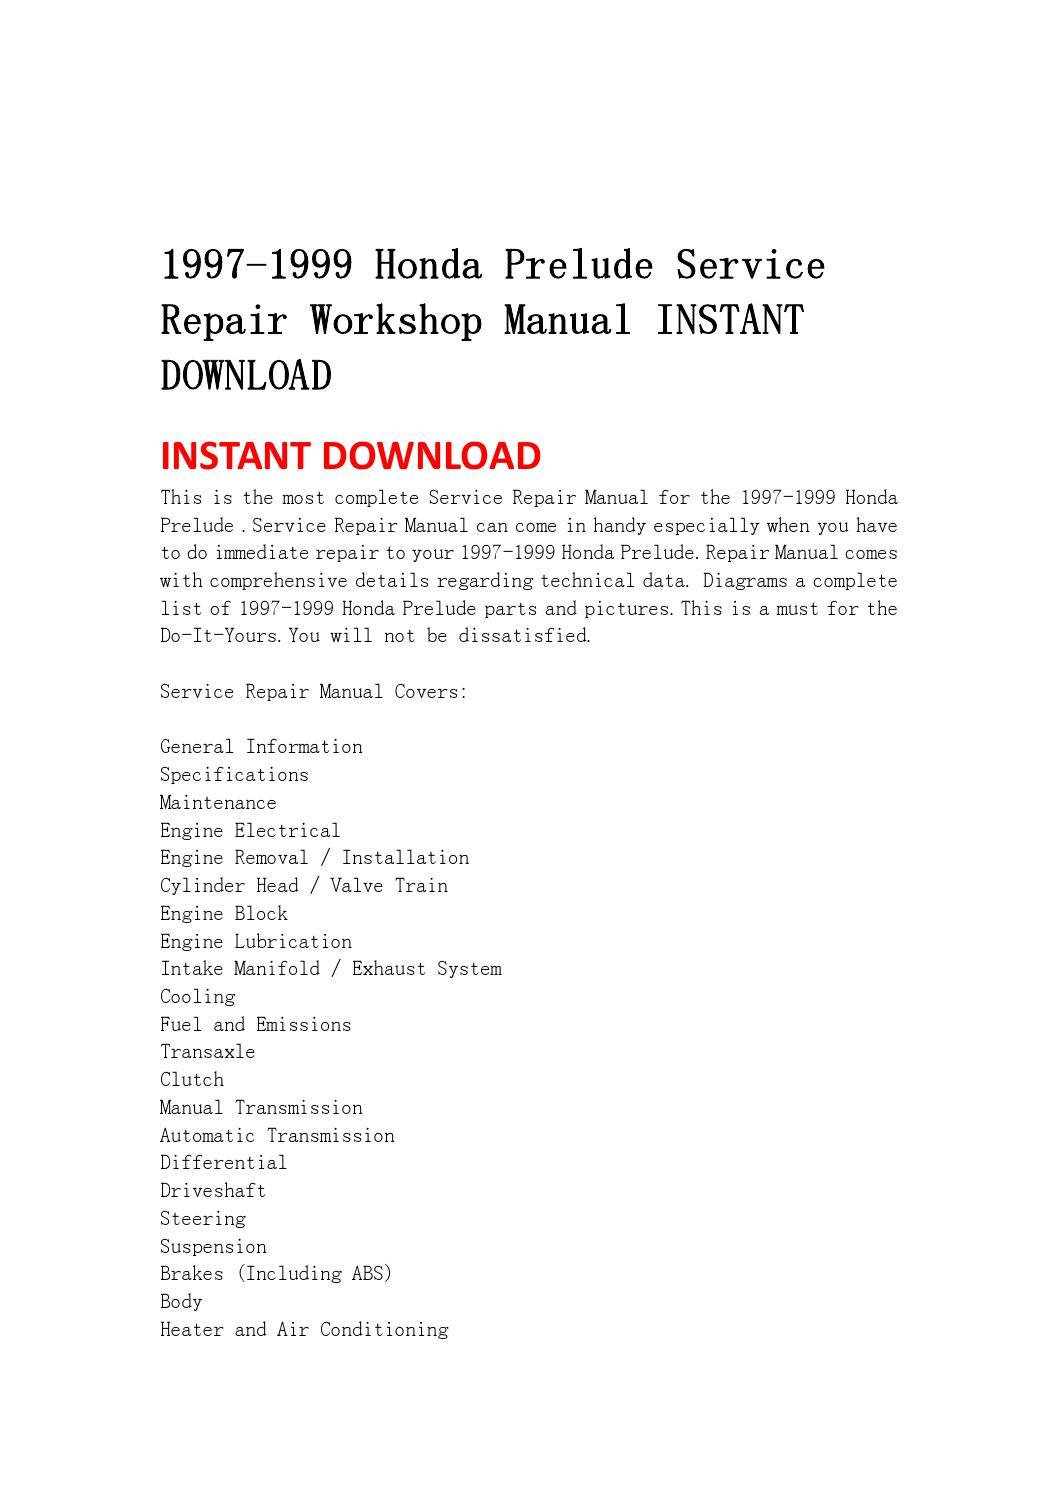 1997 1999 honda prelude service repair workshop manual instant download by  kmsjehfn mkkfjshef - issuu